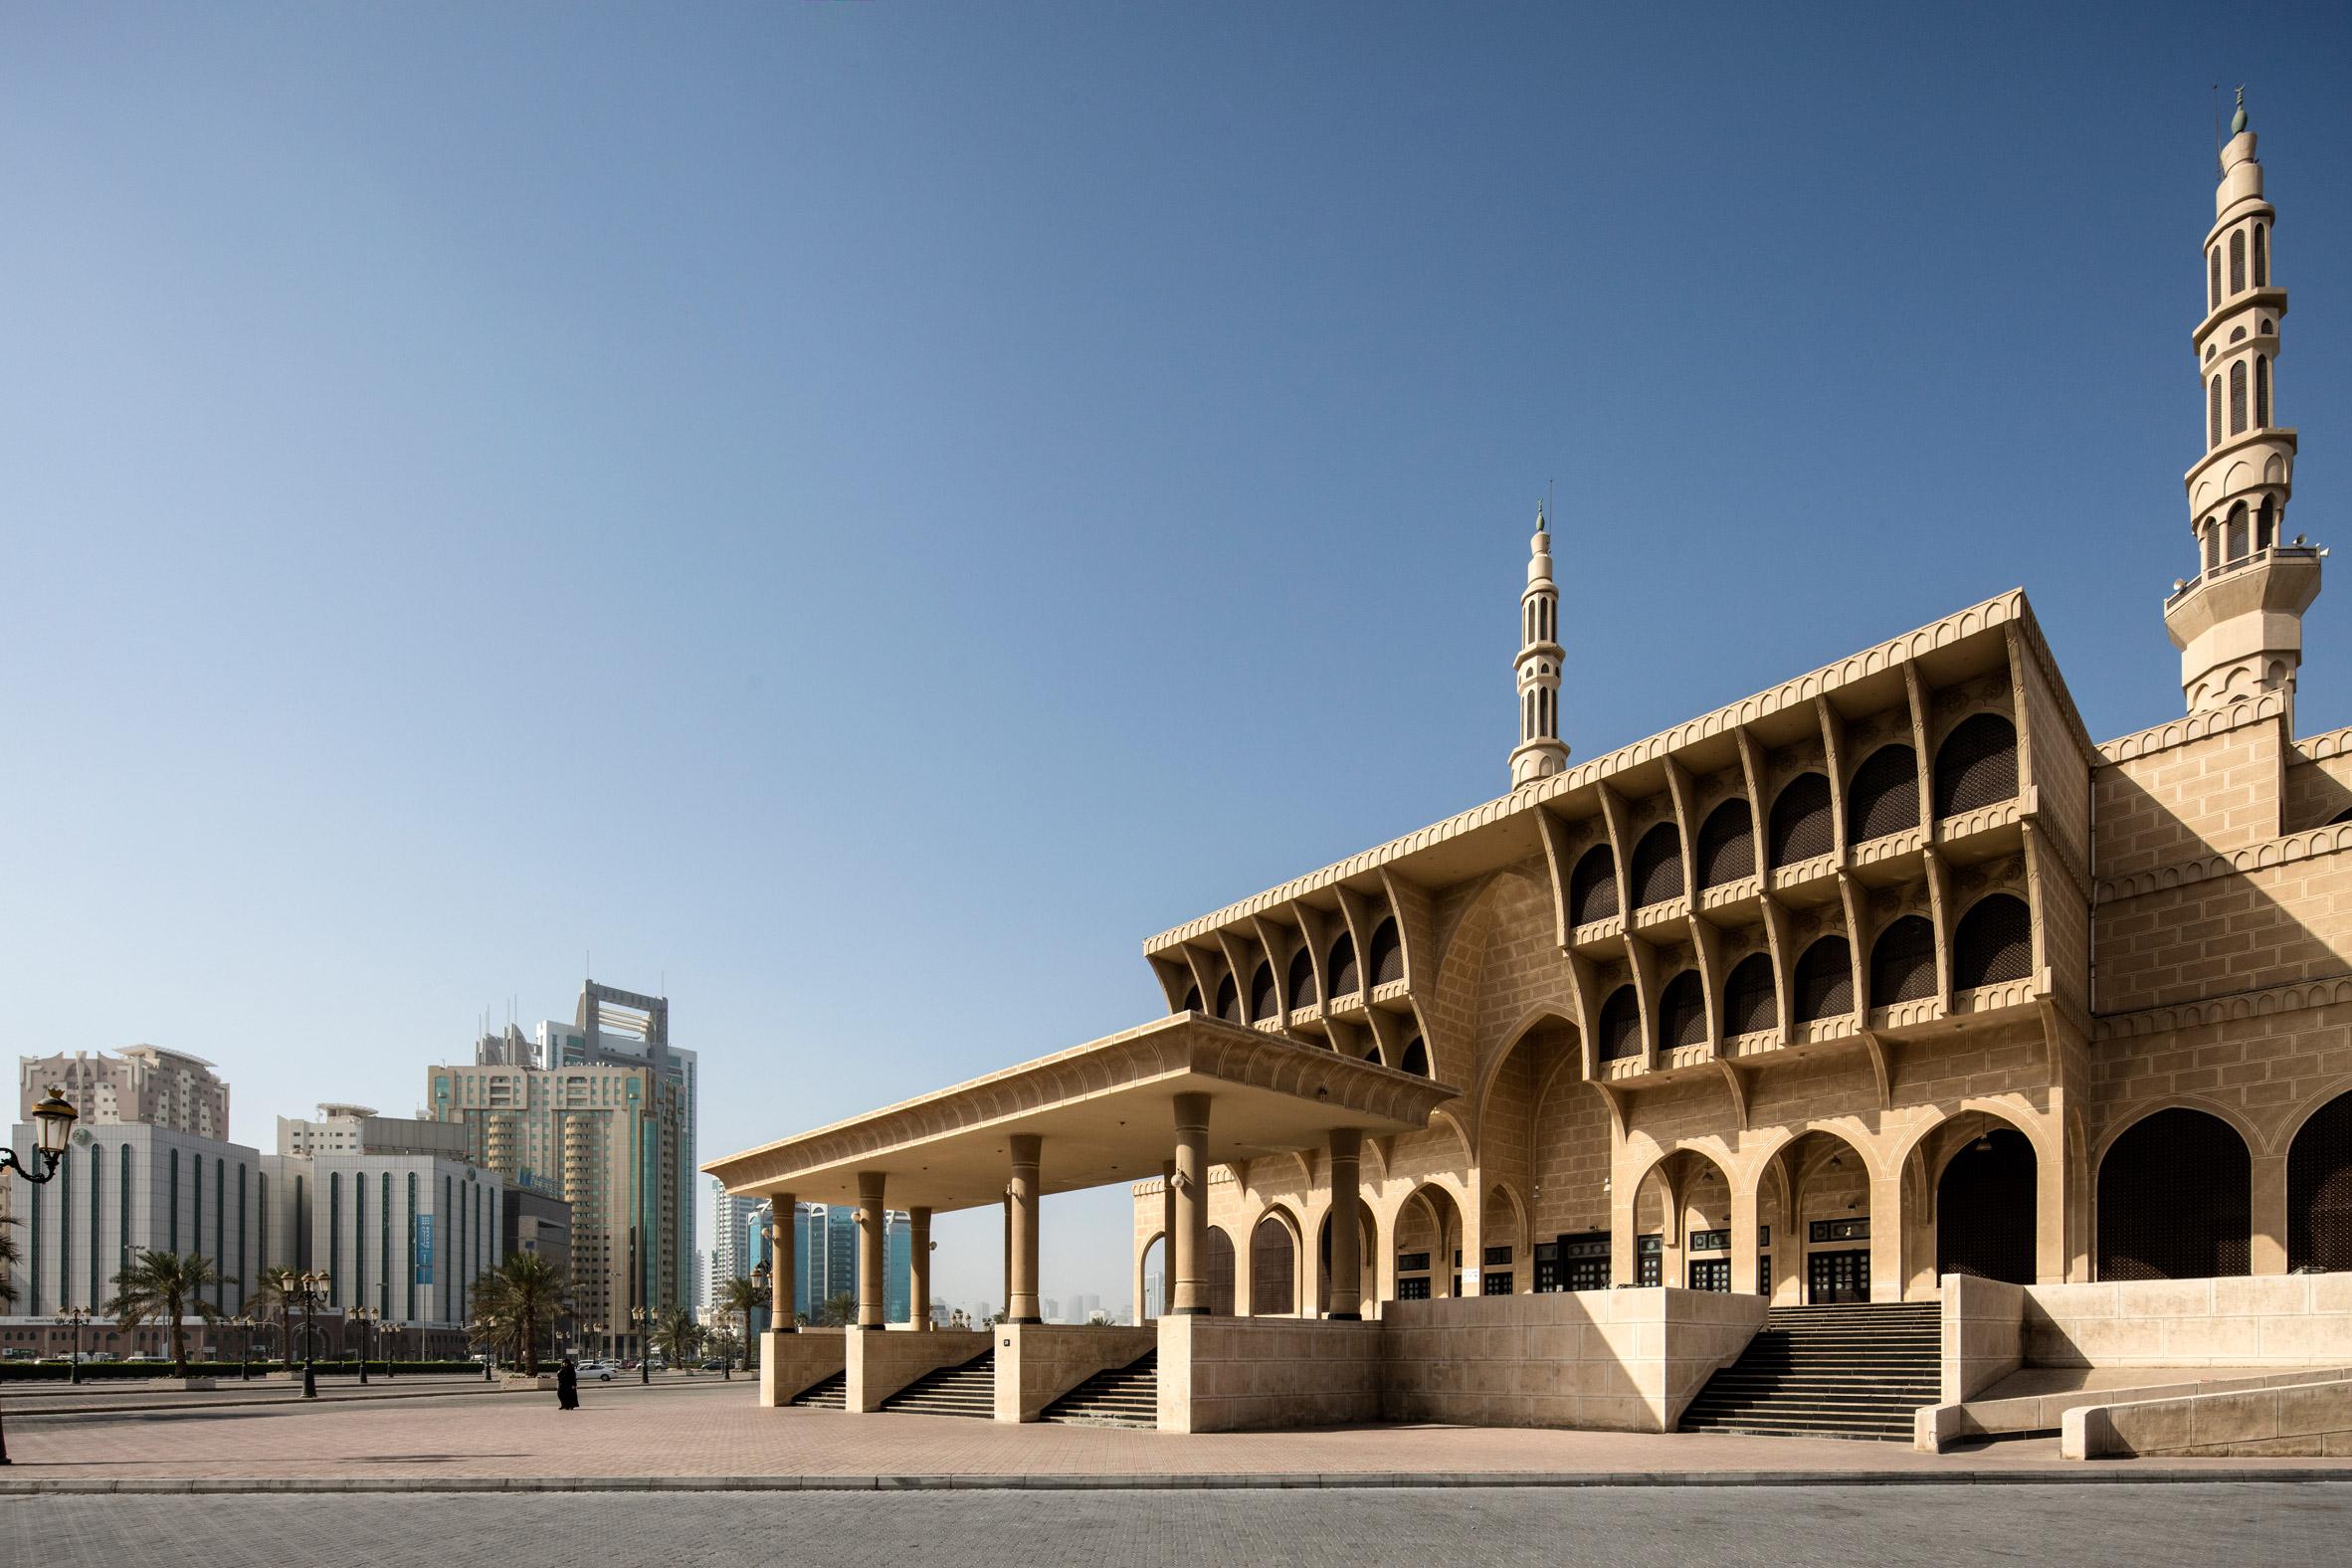 Sharjah Architecture Triennial, photo by Ieva Saudargaitė